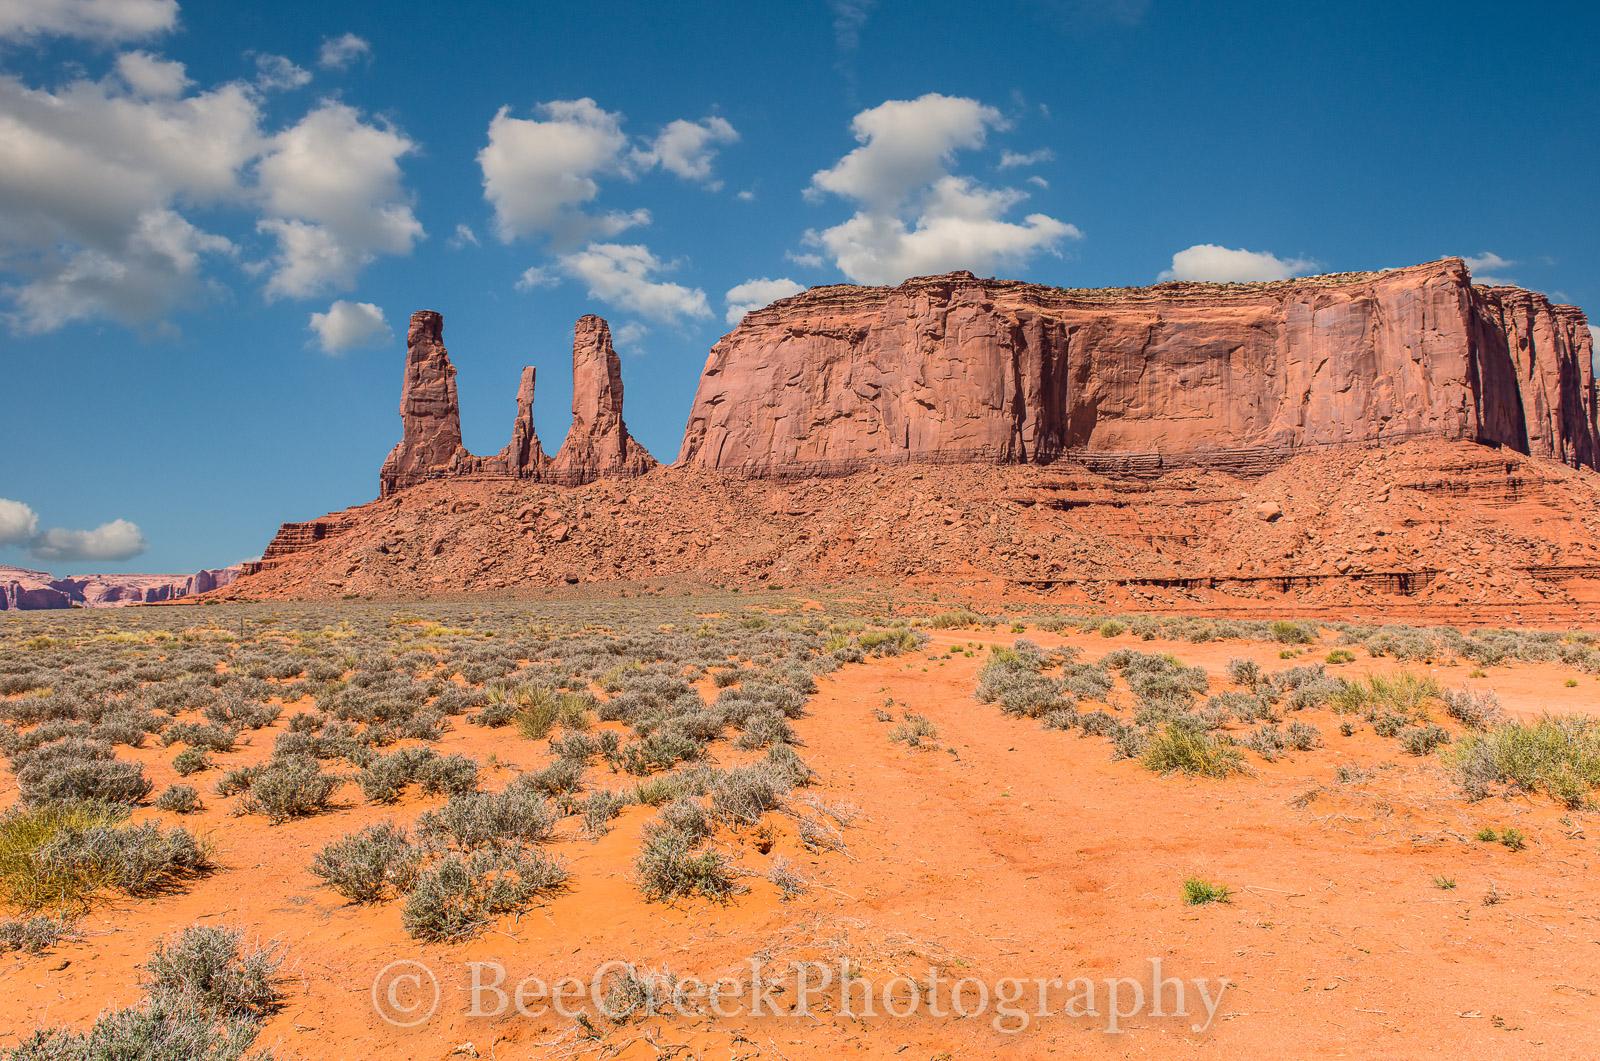 Mounument Valley, The Three sisters, desert, landscape, landscapes, southwest, us, photo